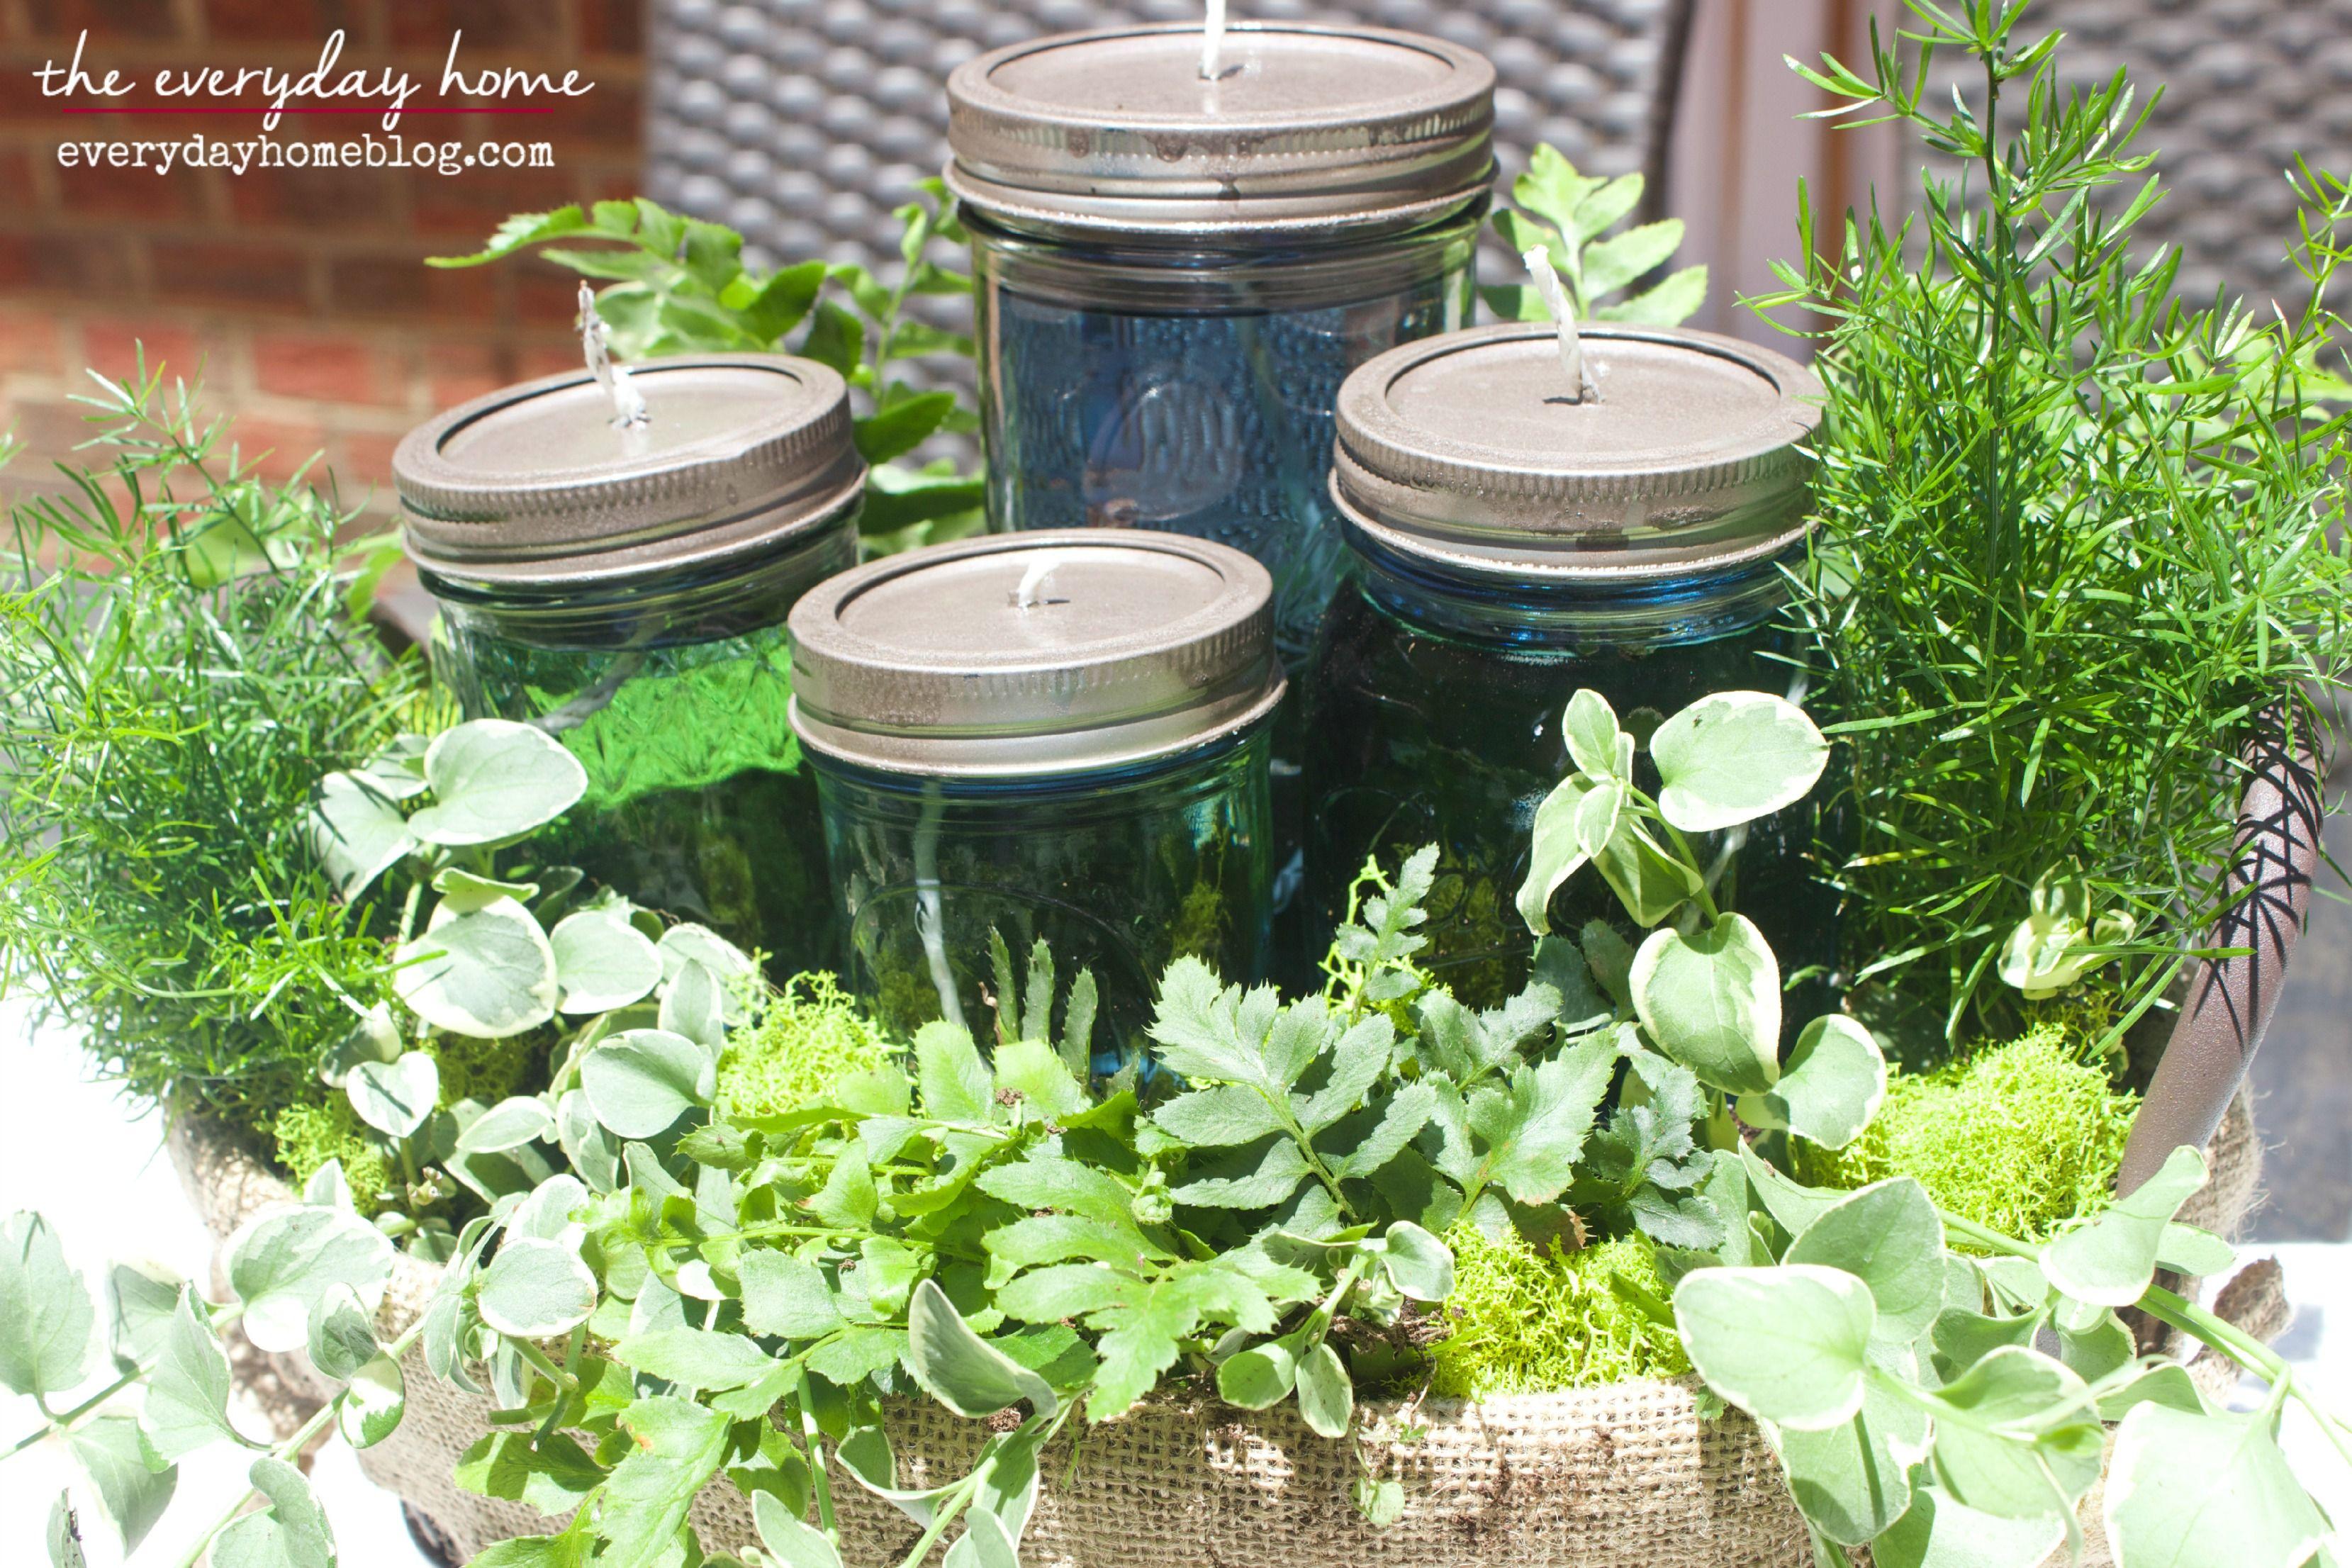 DIY Citronella Mason Jar Candles The Everyday